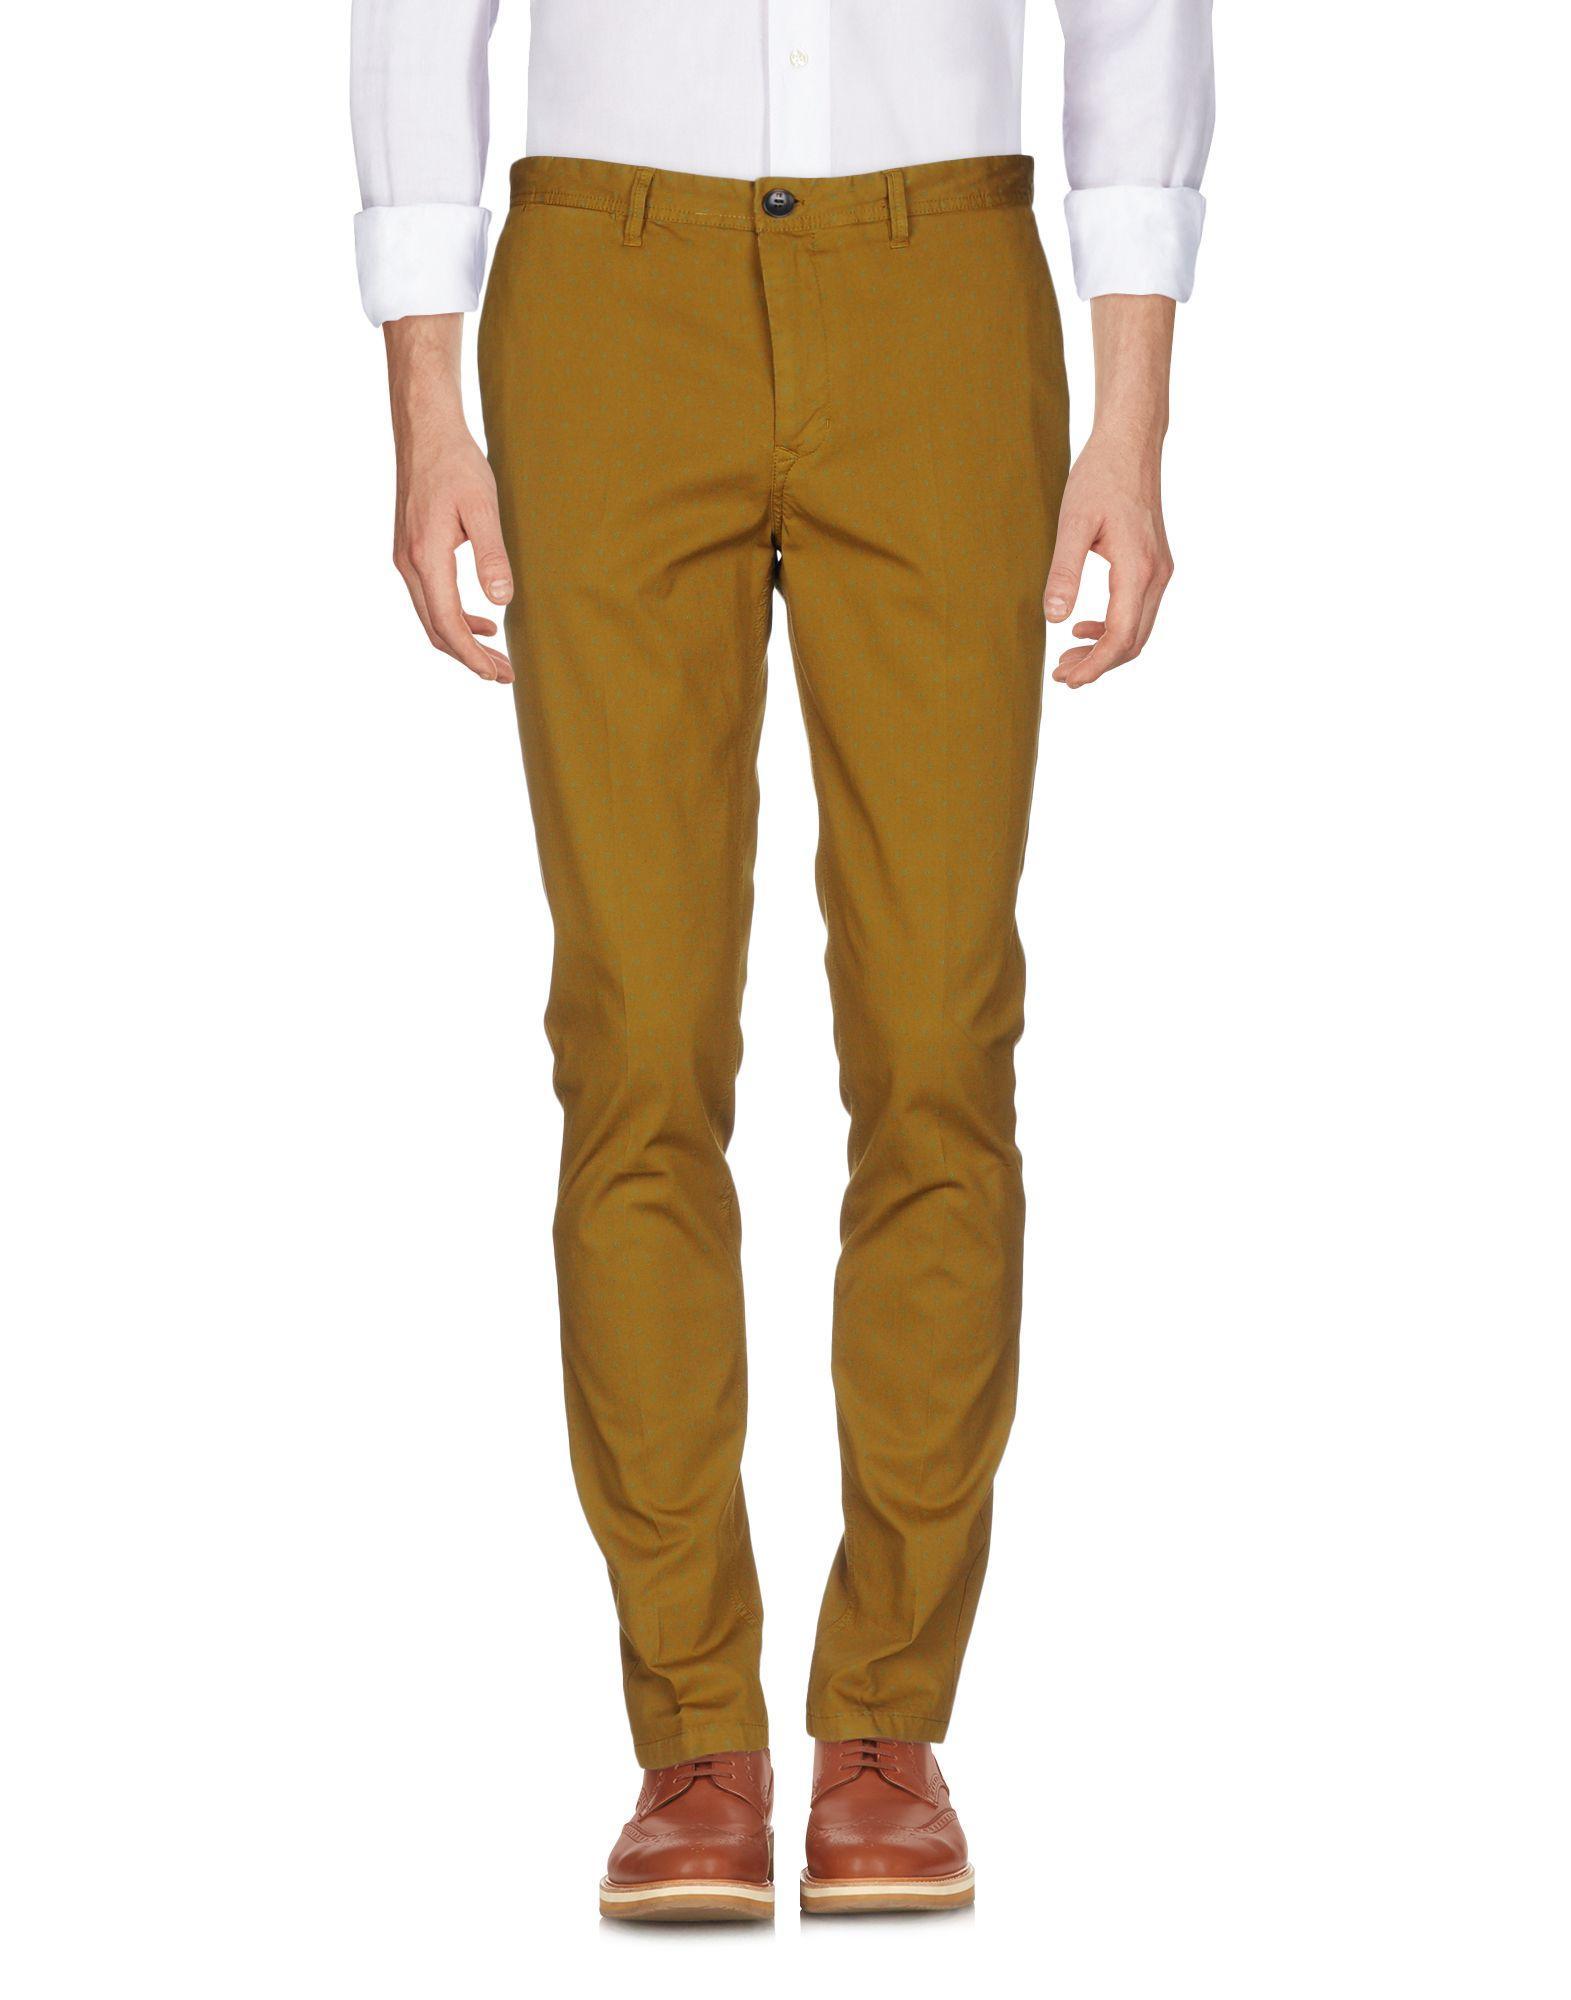 Scotch & Soda Casual Pants In Camel